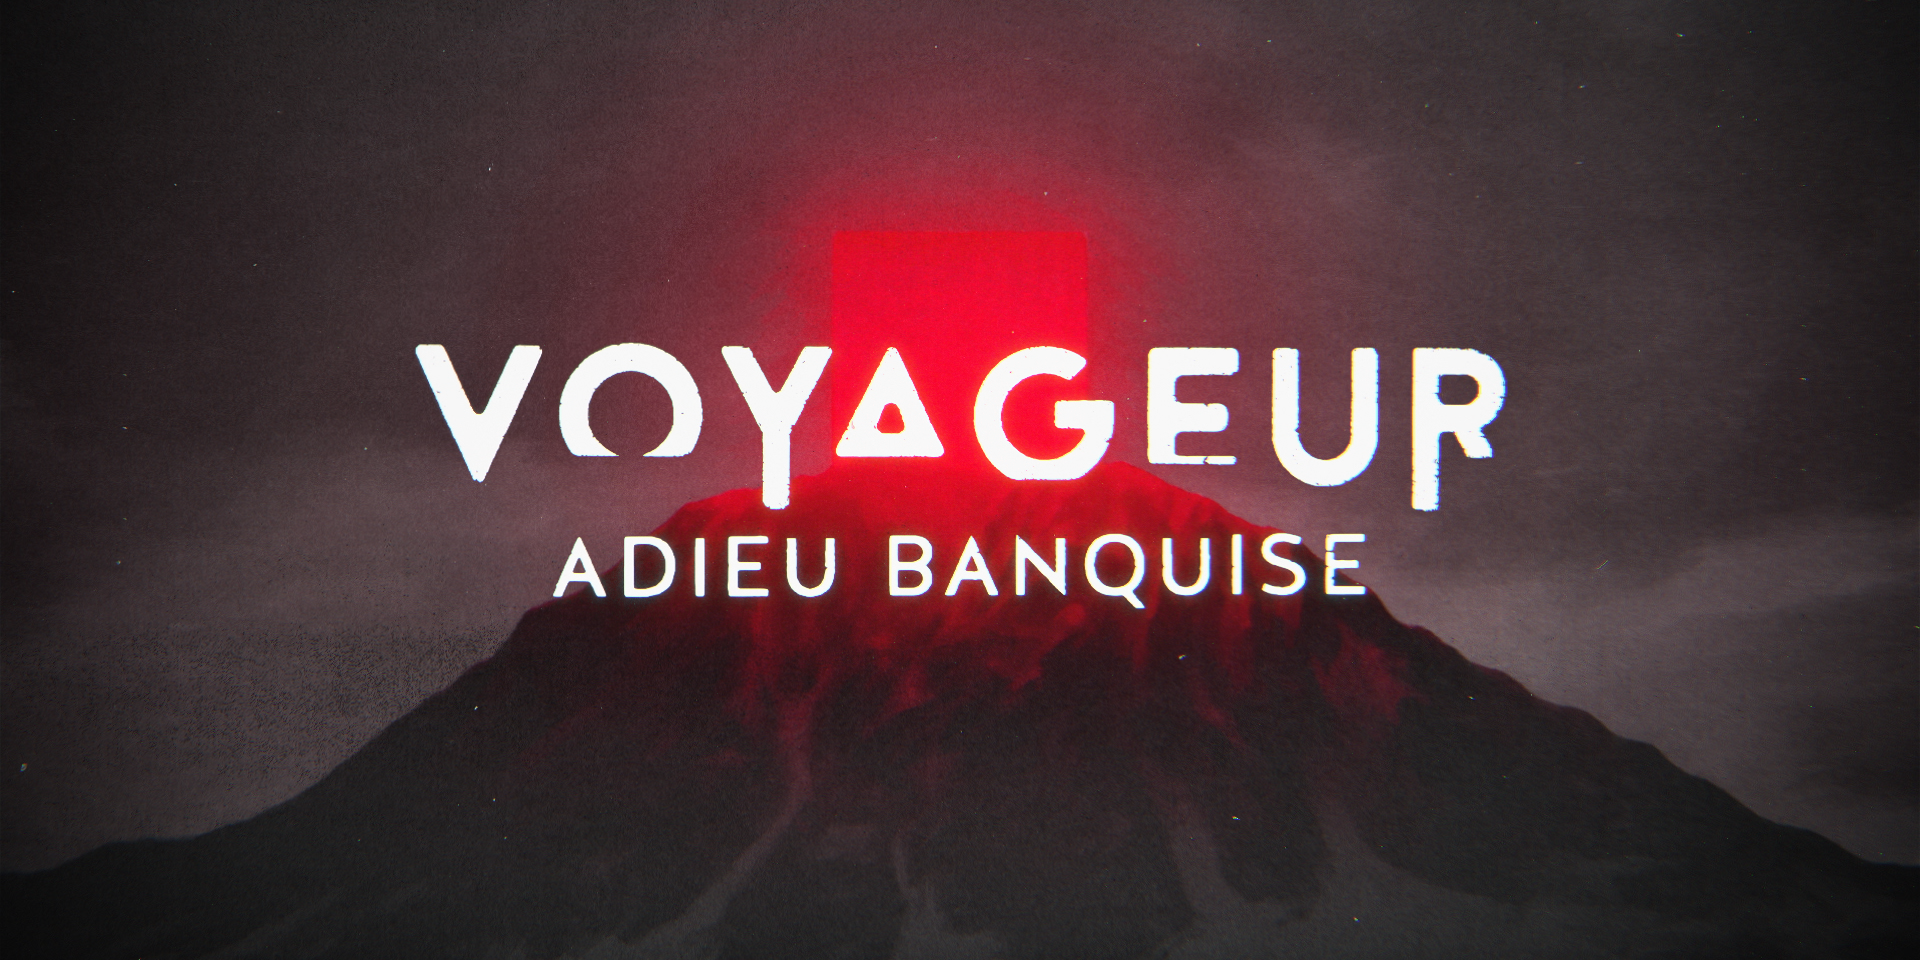 Voyageur – Adieu Banquise (EP Teaser)